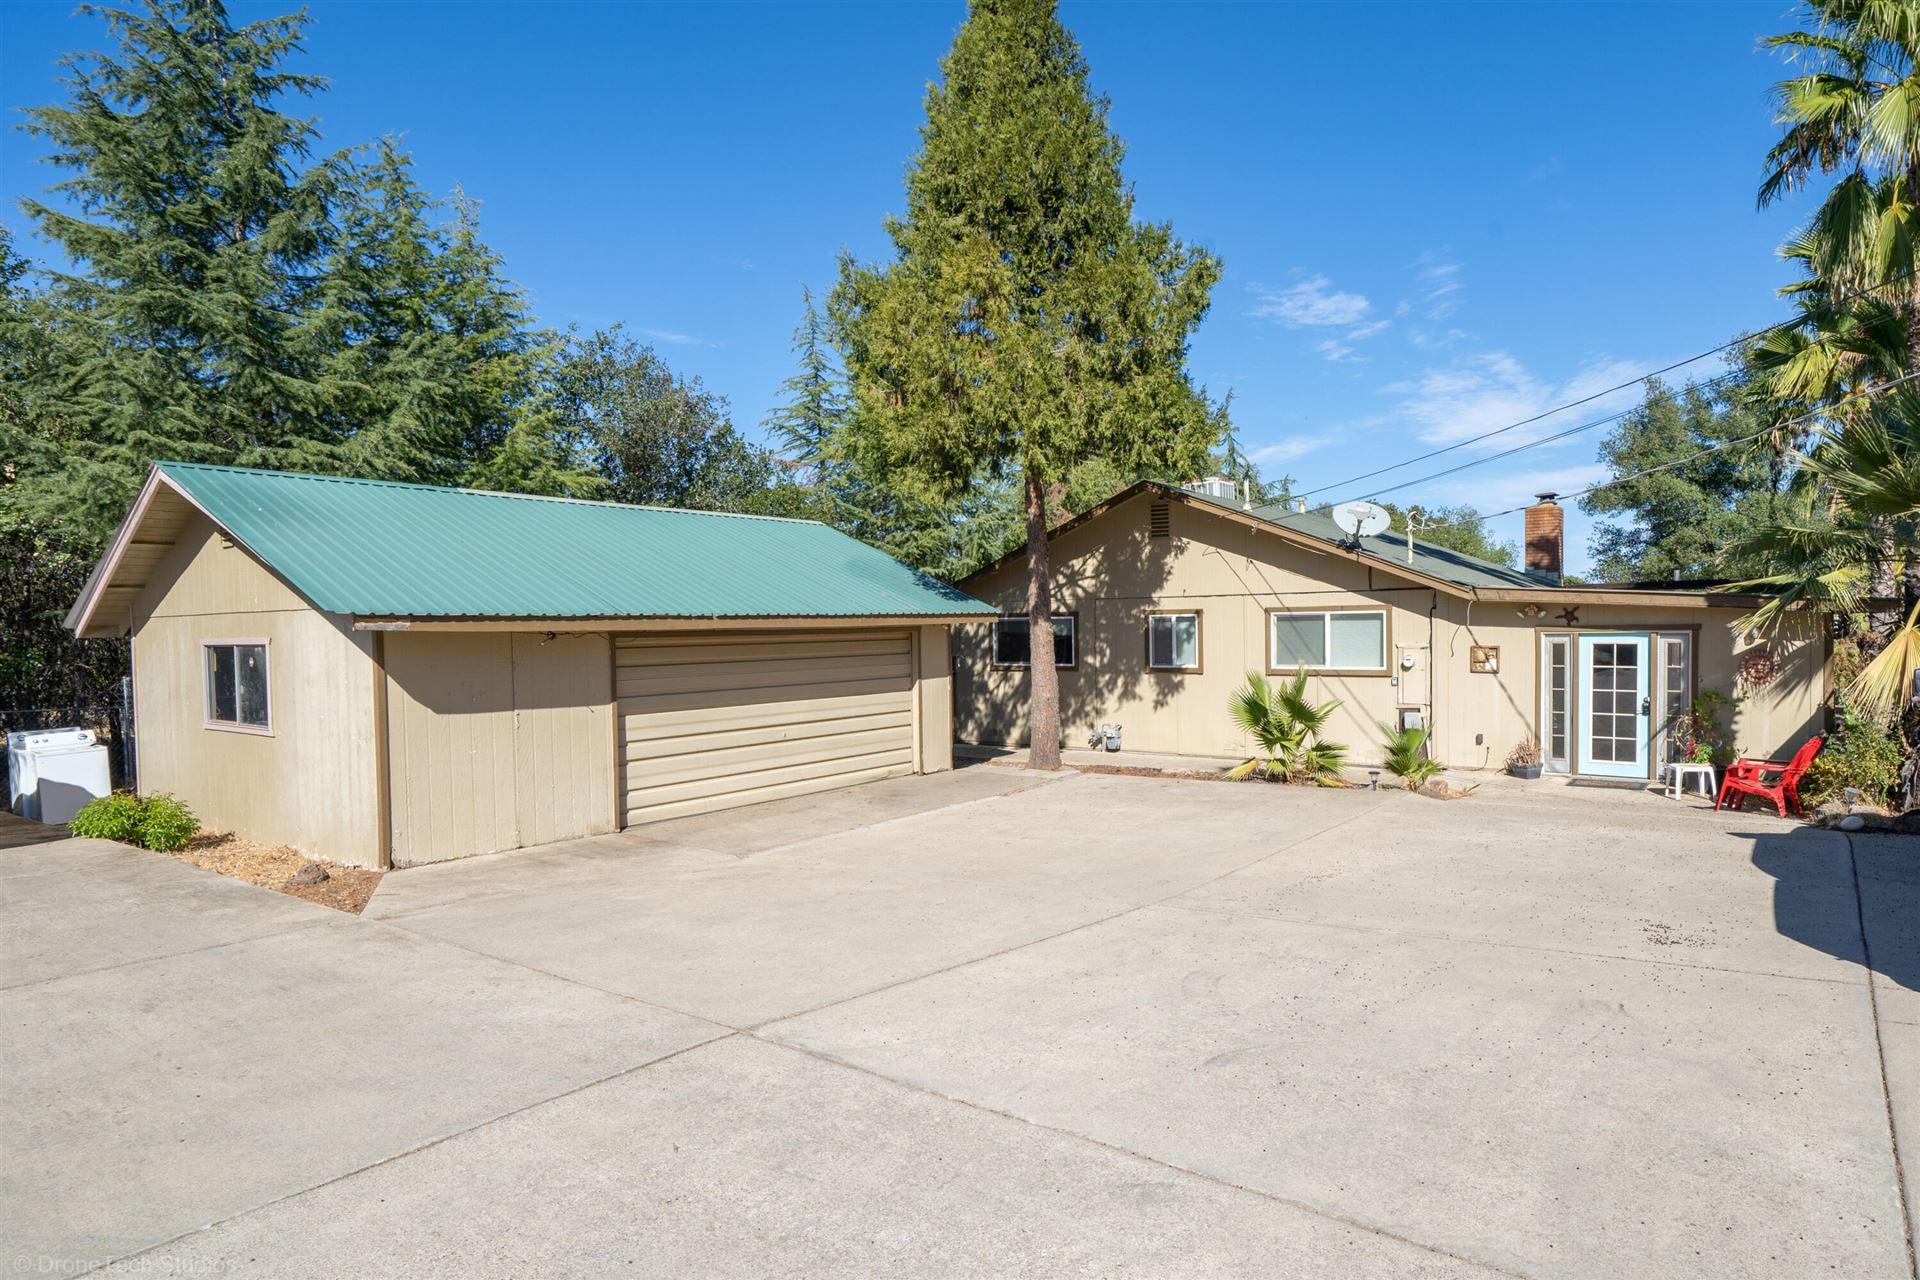 Photo of 20470 Hurst Ln, Redding, CA 96002 (MLS # 21-4909)